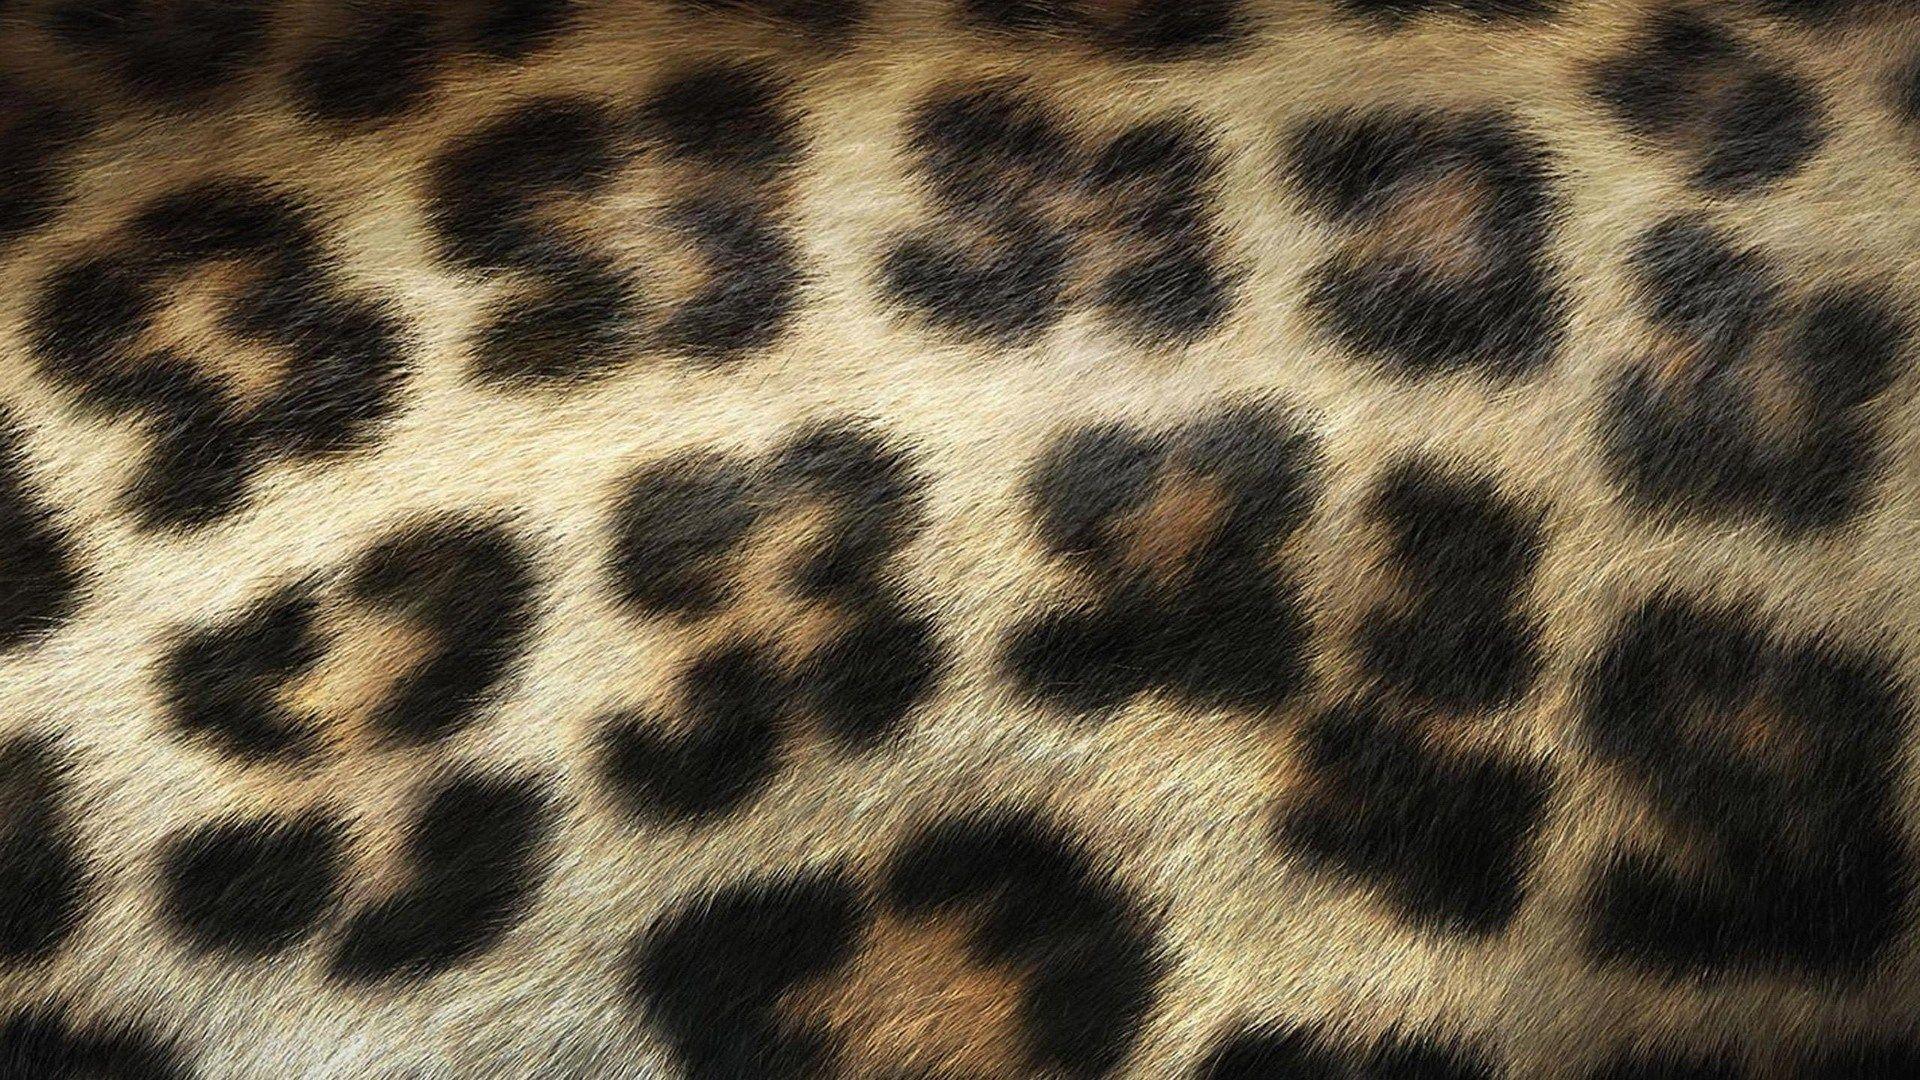 leopard print wallpapers hd free download